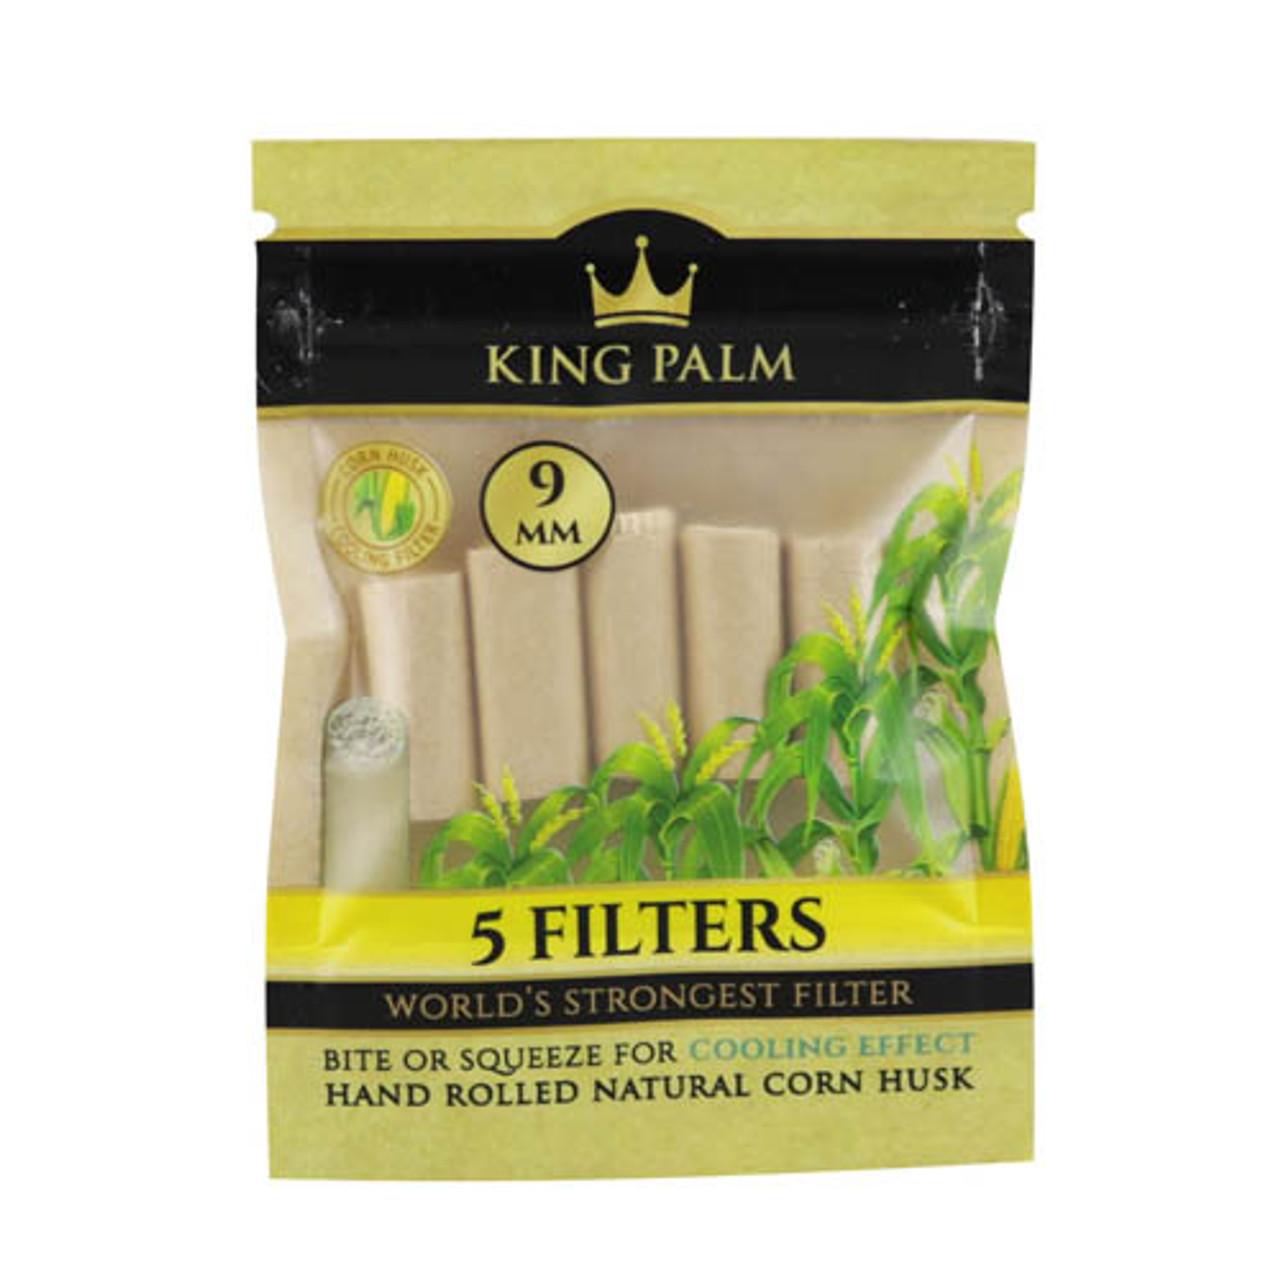 King Palm Corn Husk Filters 5ct (Display of 24)